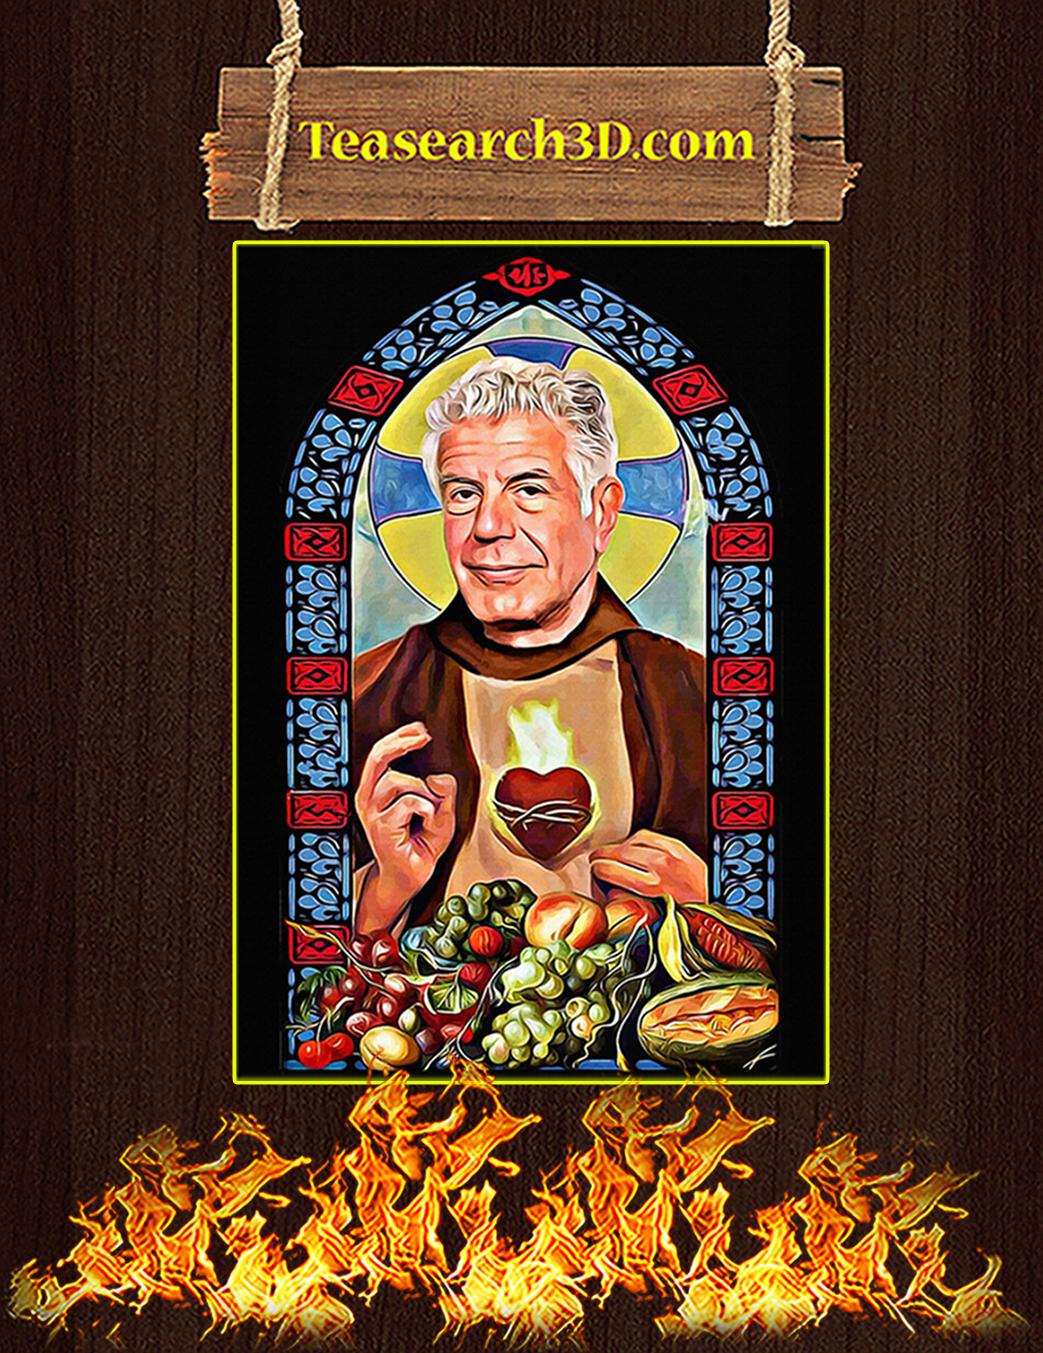 Patron saint of food and life prayer poster A1